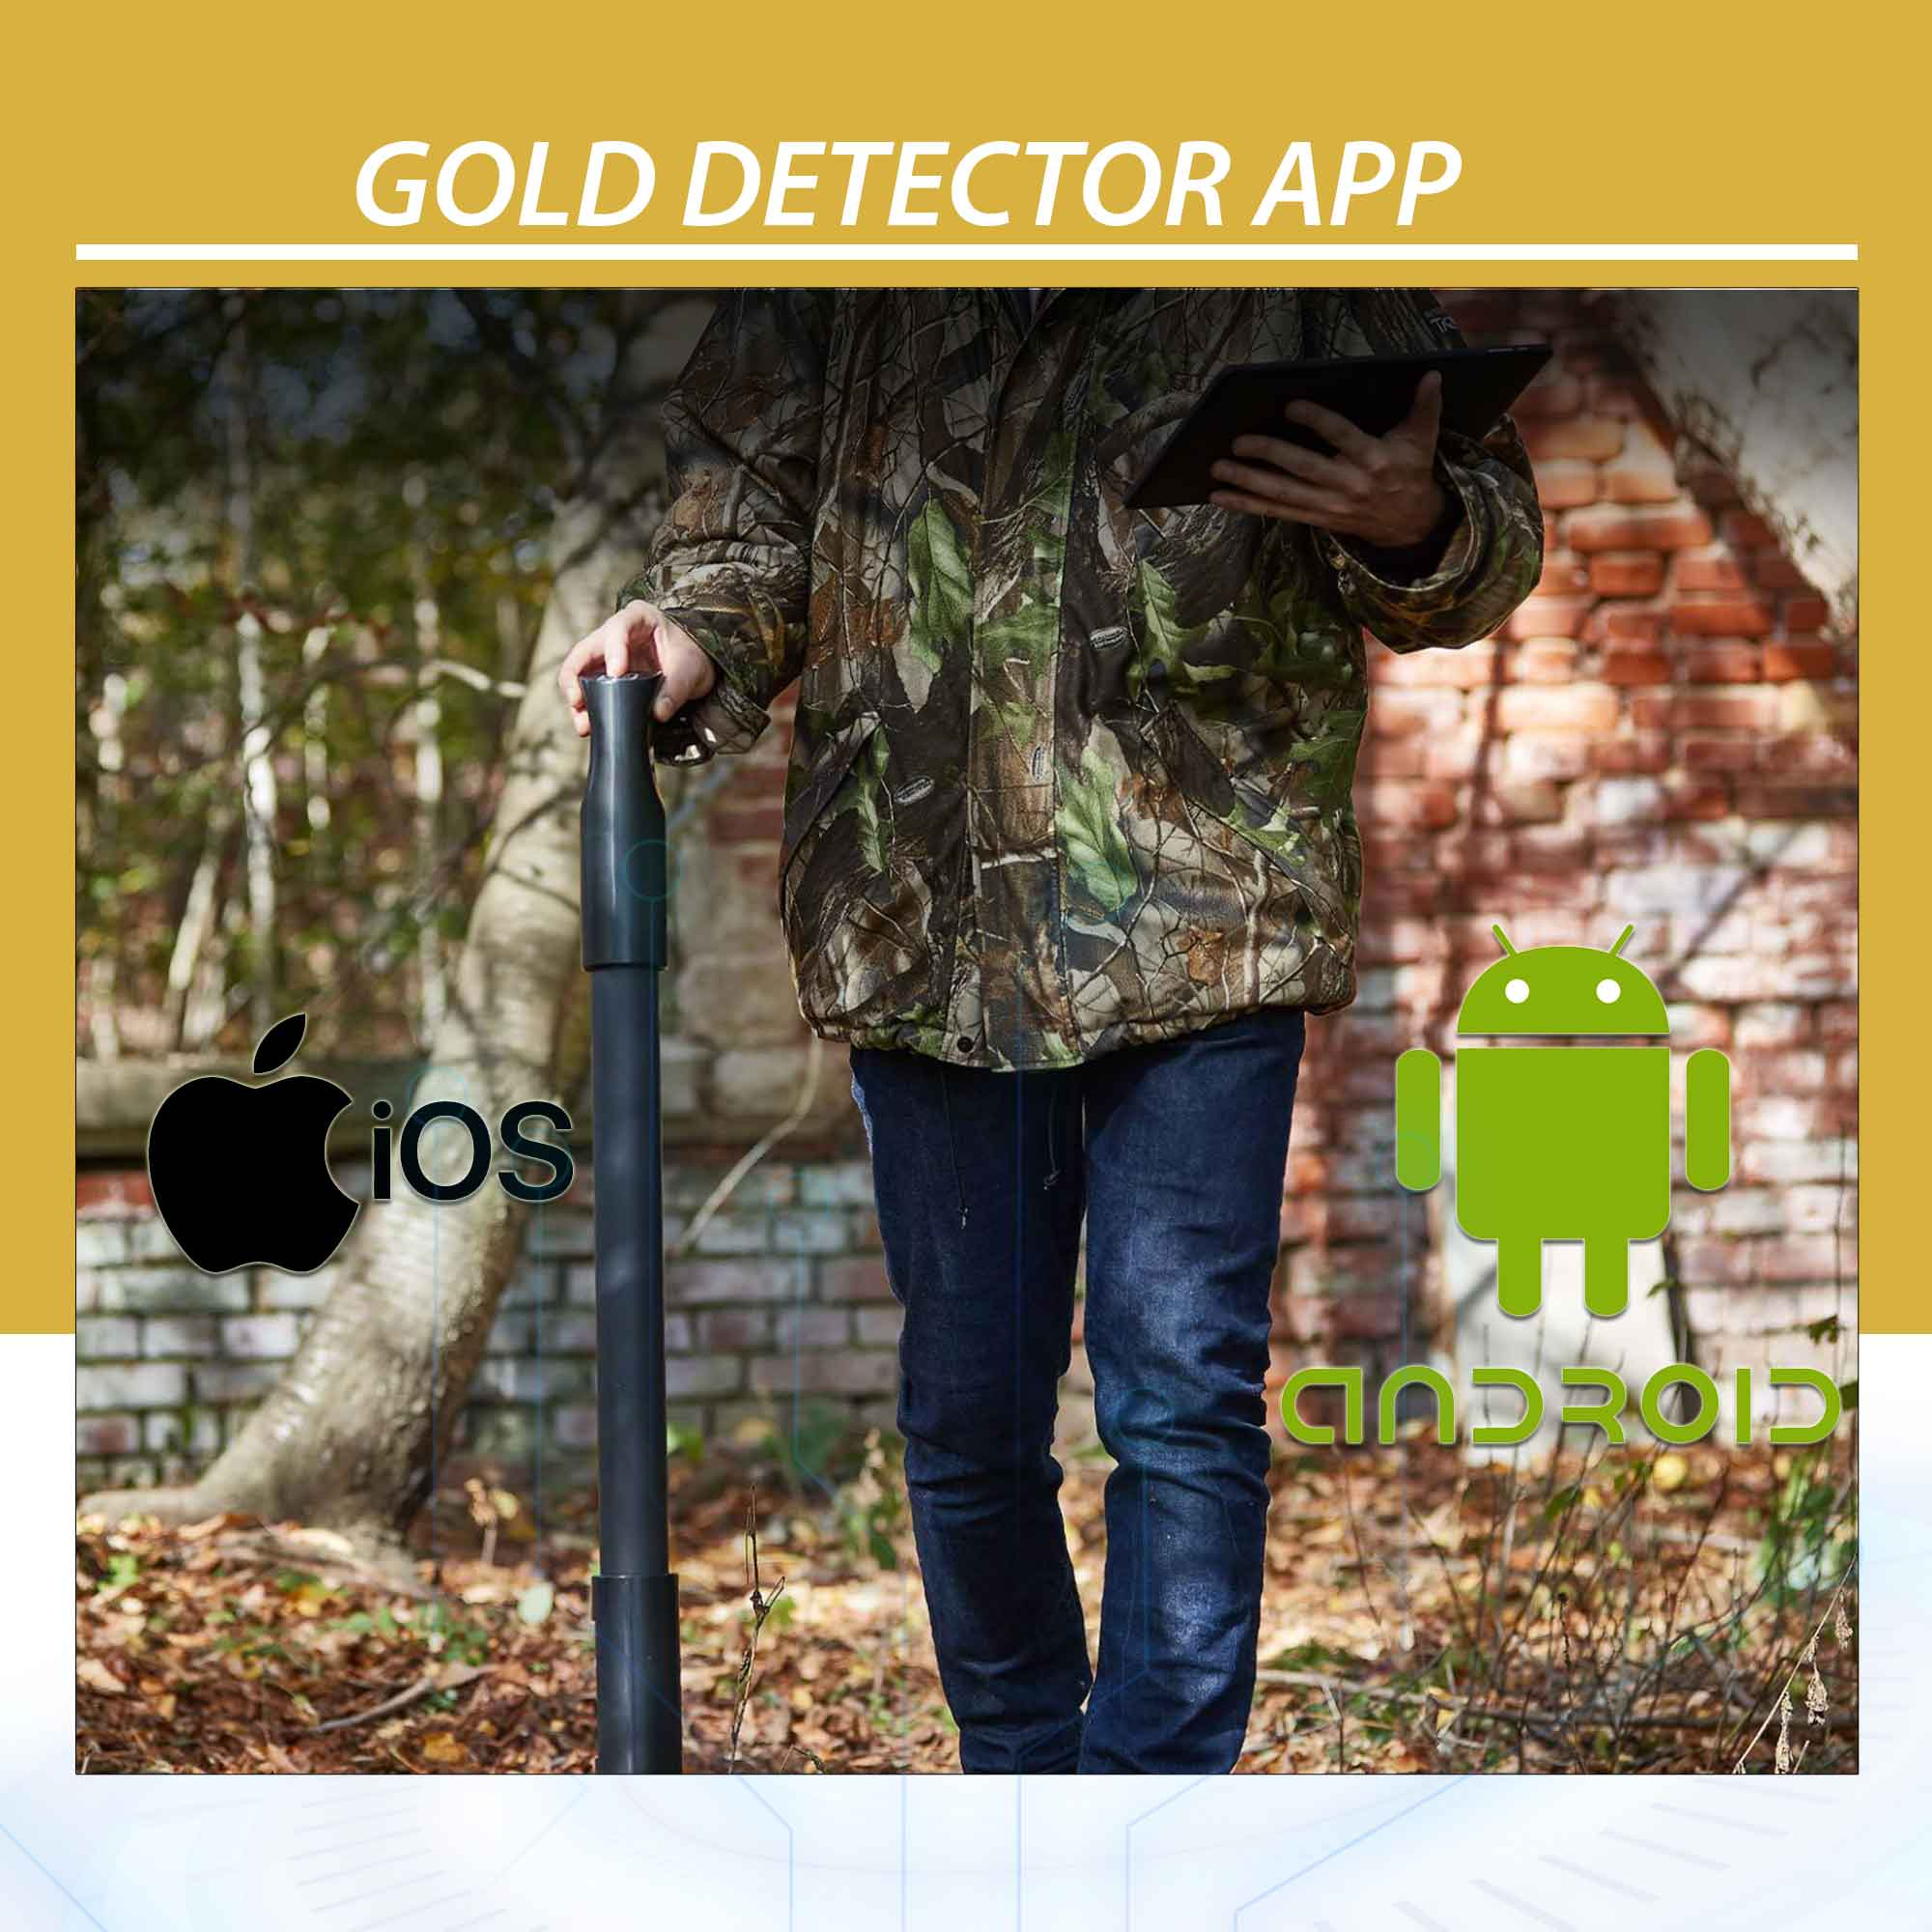 Gold Detector App